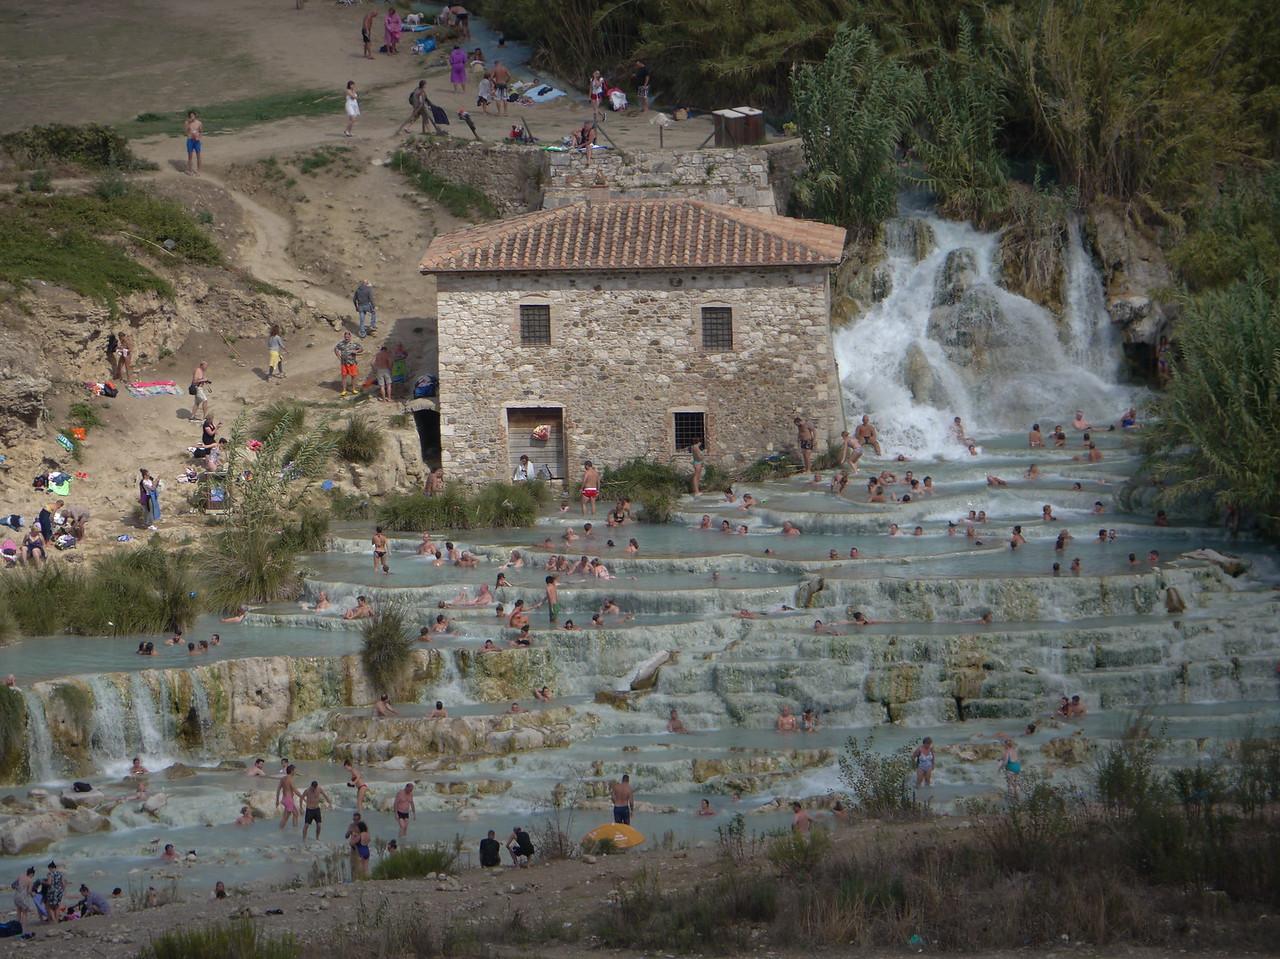 @RobAng 15.09.17, 10:59: Terme di Saturnia, 160 m, Poderi Di Montemerano, Toscana, Italien (ITA)